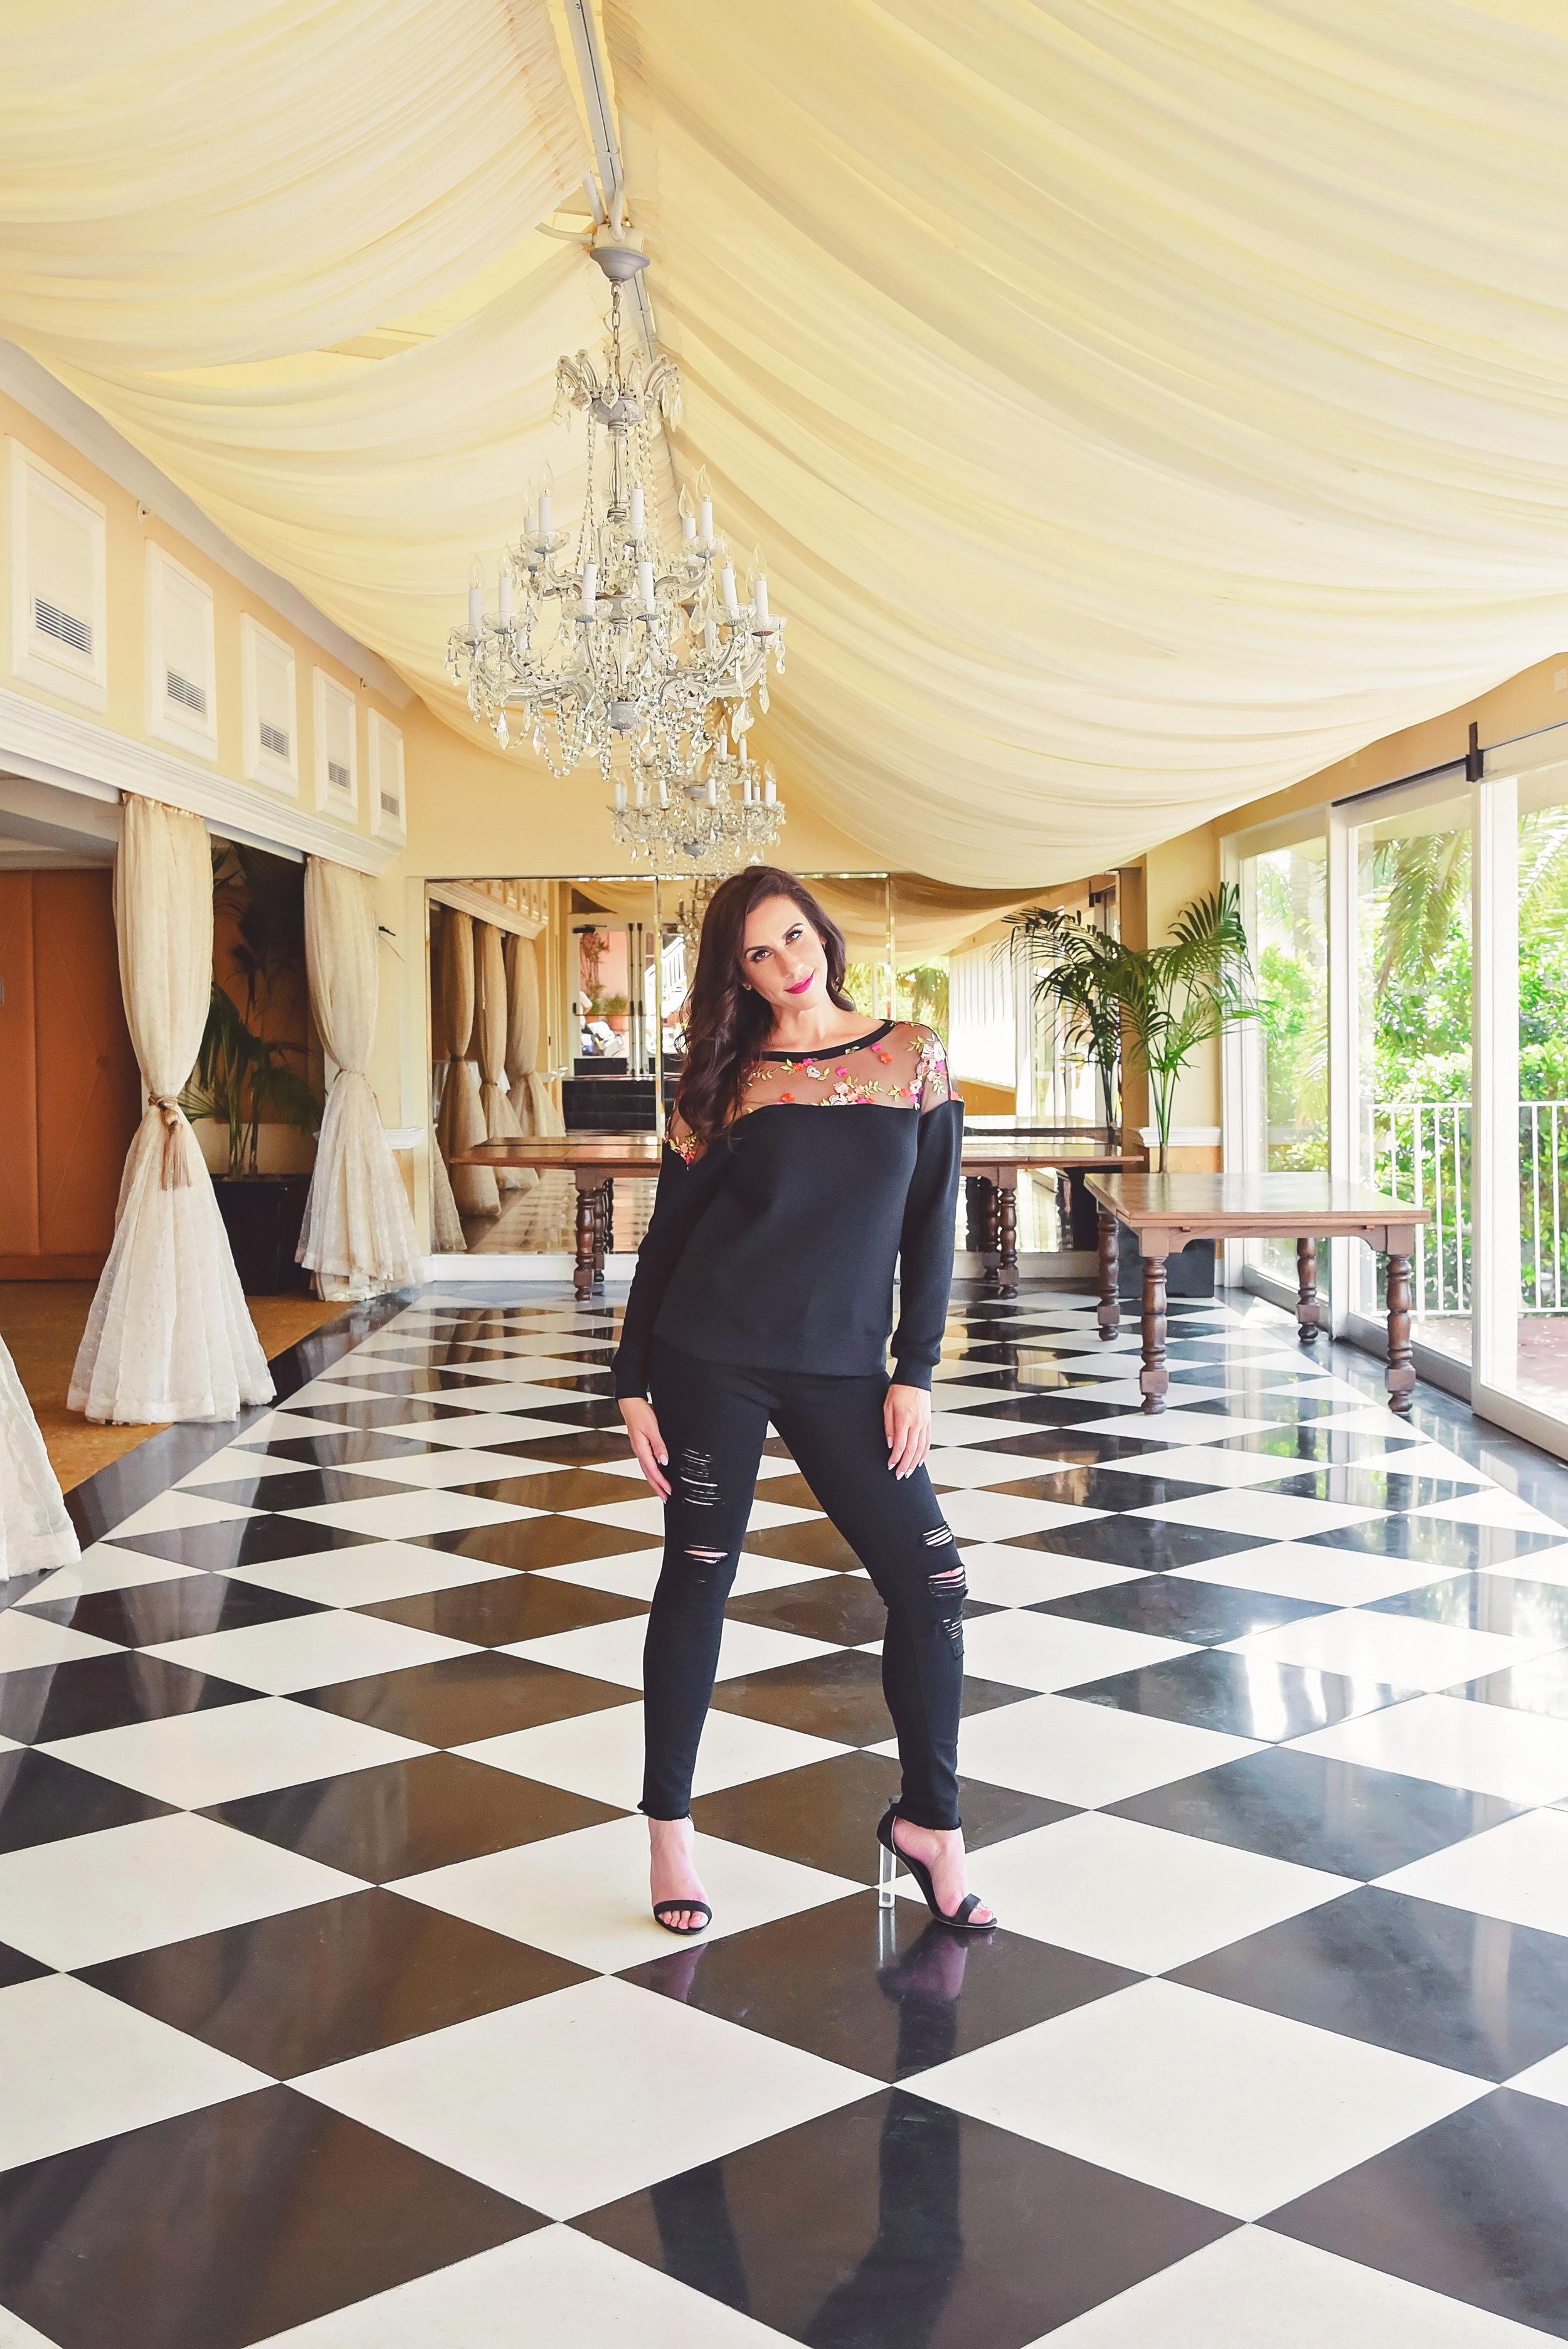 Fashion Floral Shirt Heels | Fashion Photography | Lacey O